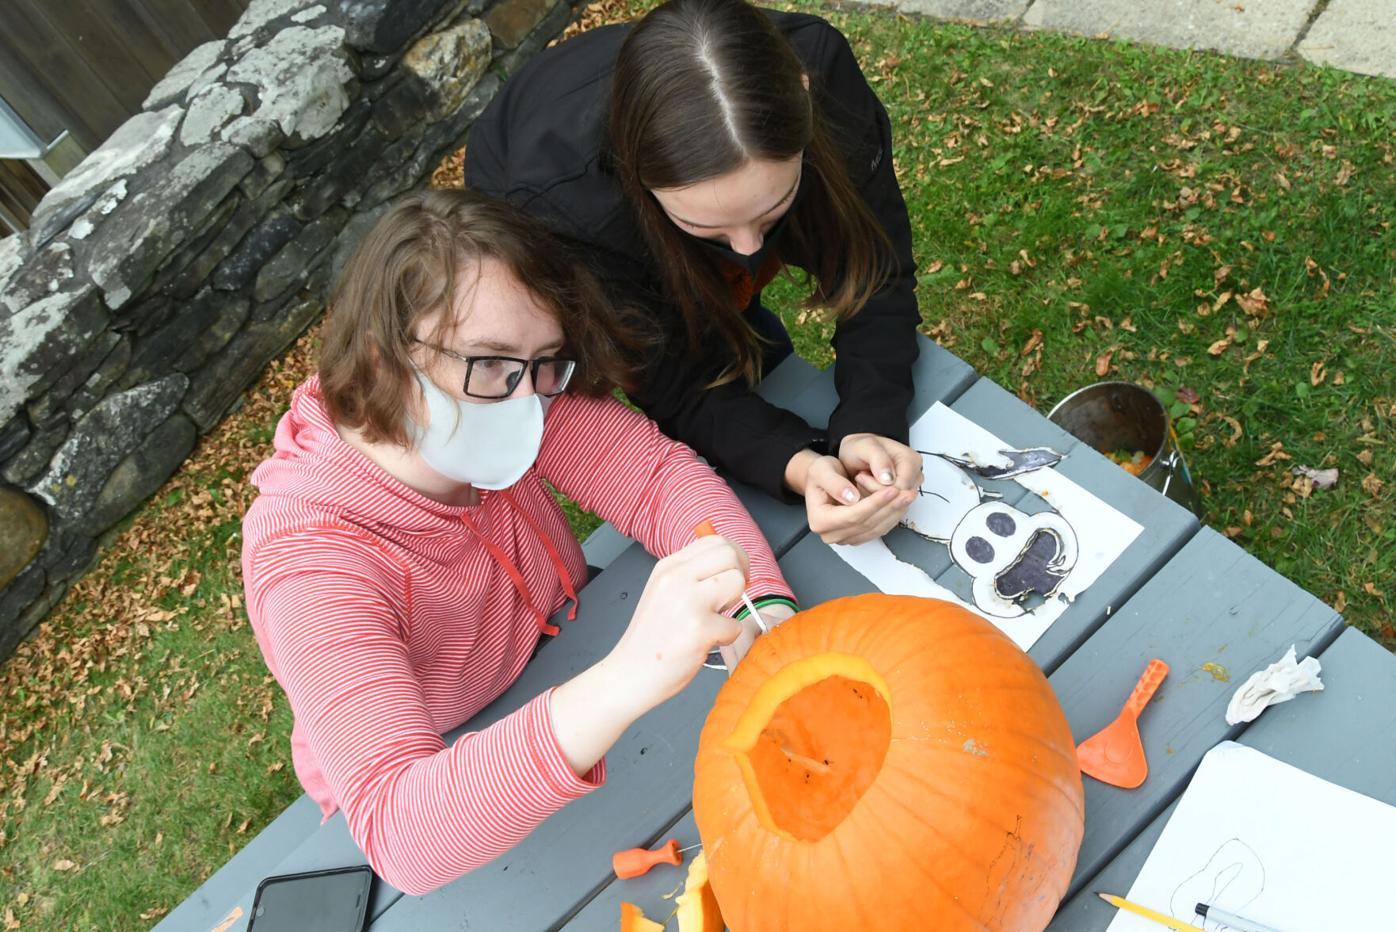 Bennington College Students Carve a Pumpkin